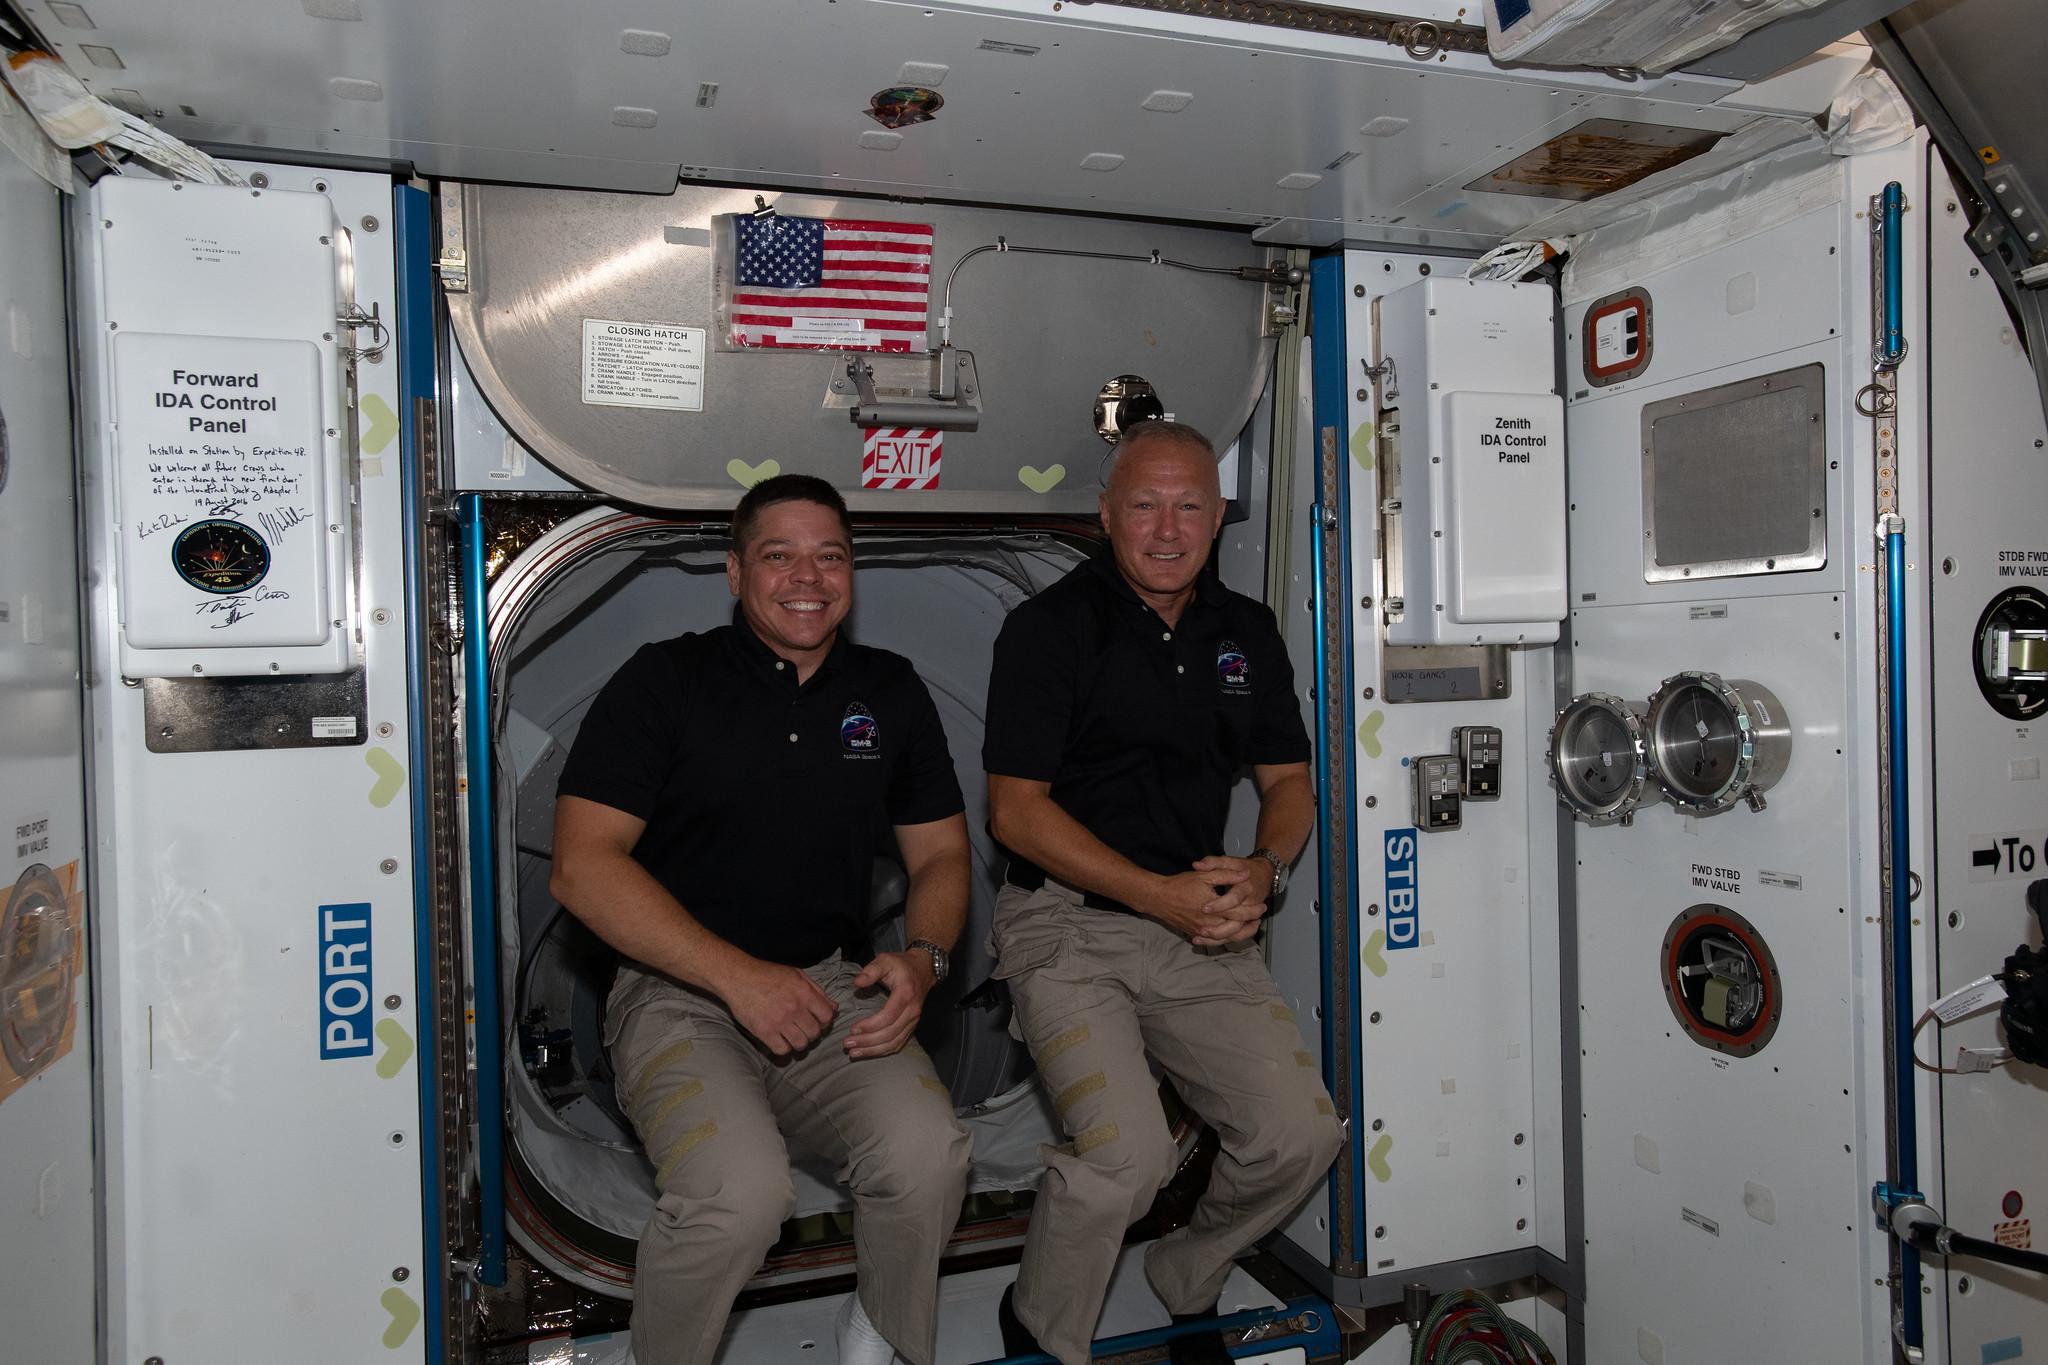 NASA Broadcasts First Splashdown of American Astronauts in 45 Years